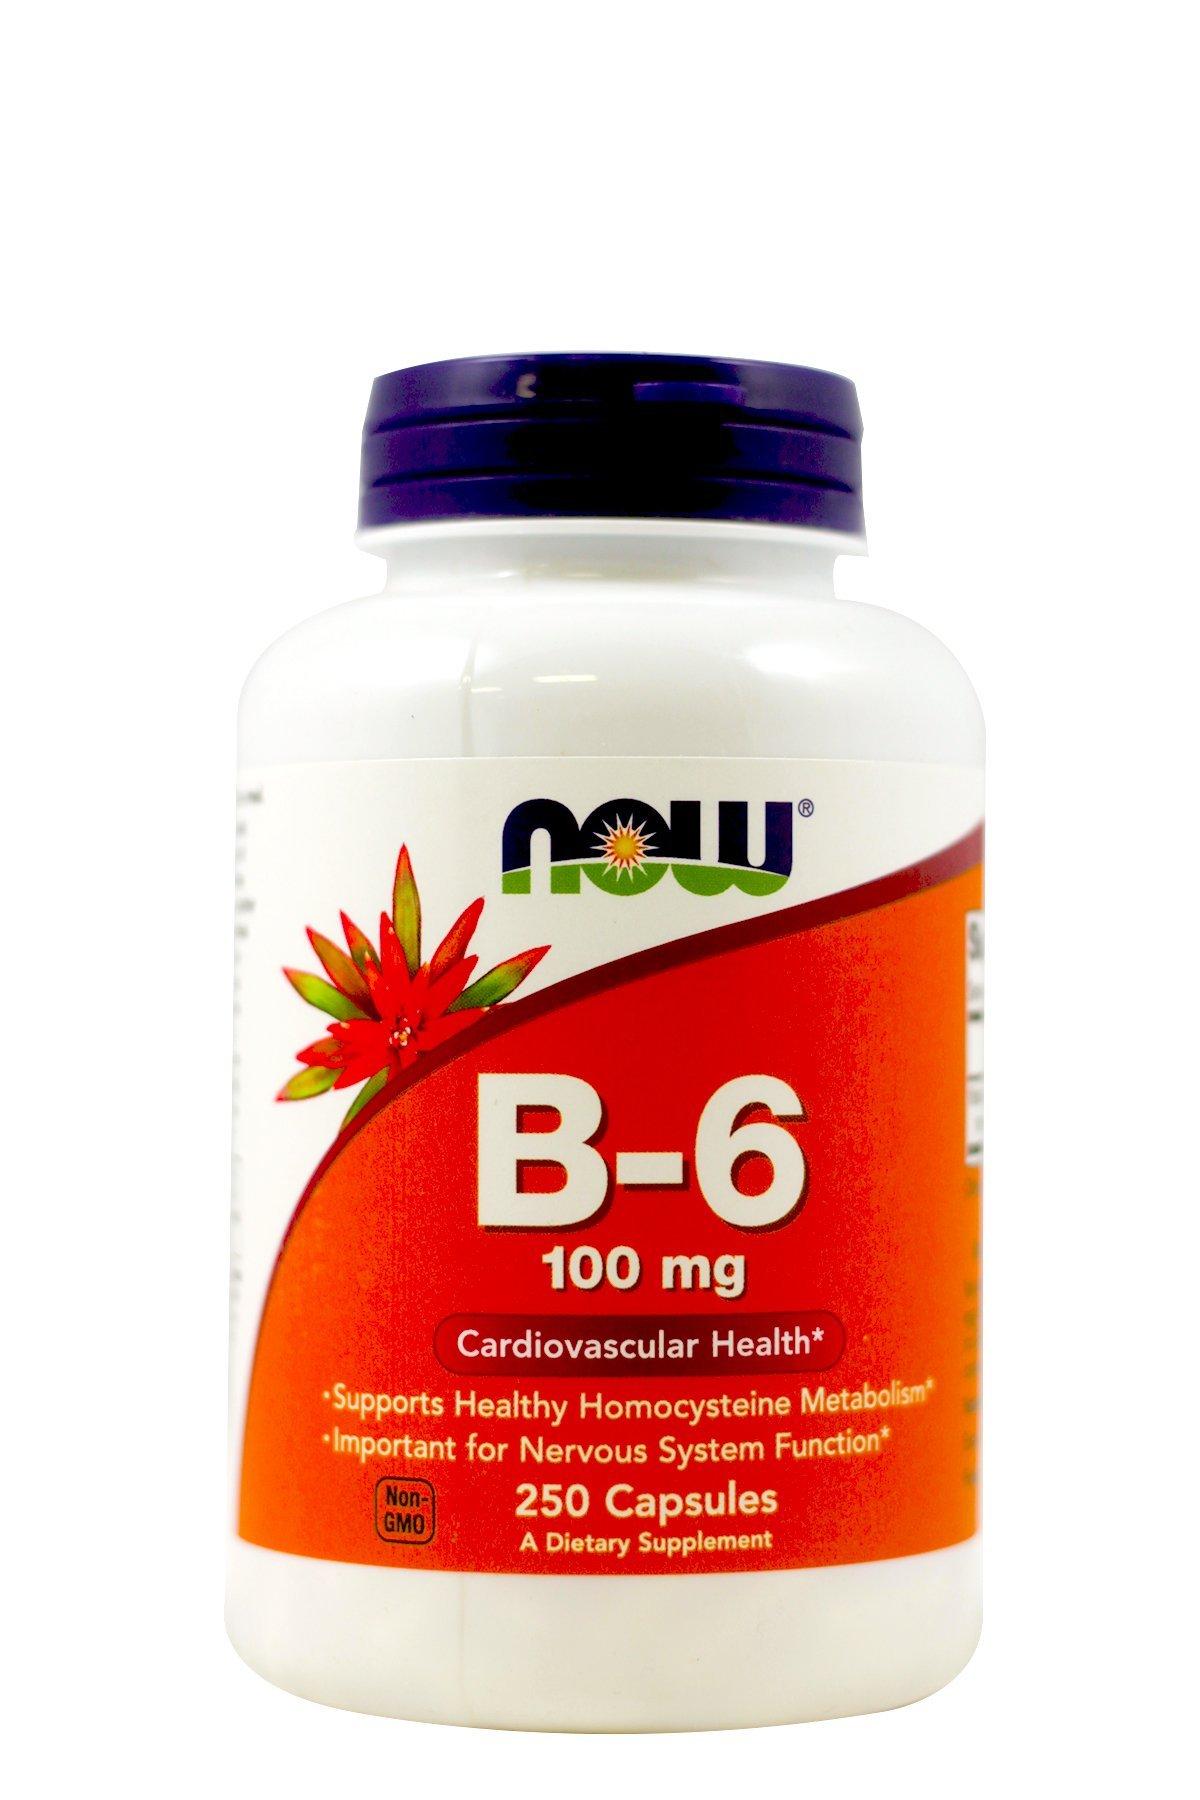 NOW Vitamin B-6 100 mg,250 Capsules